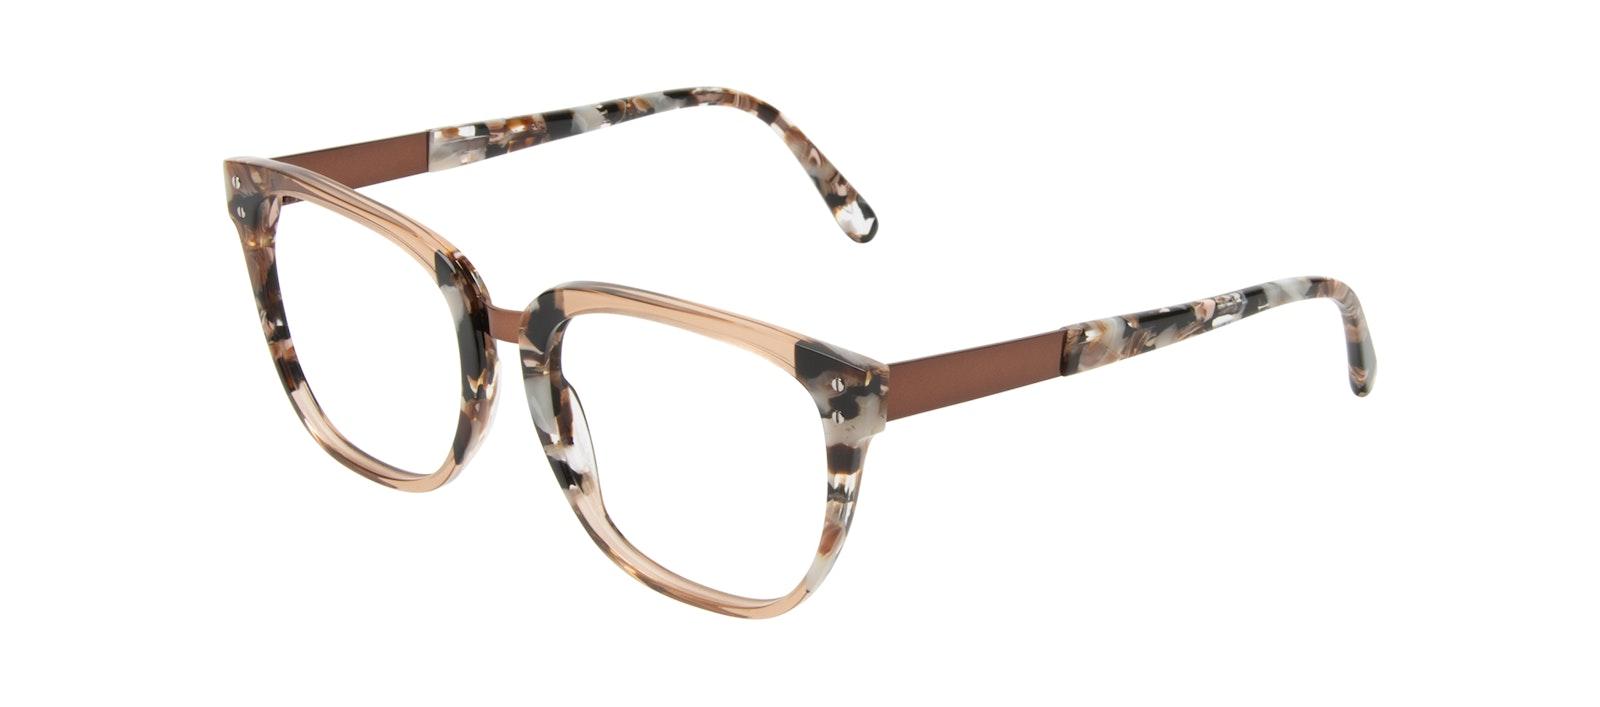 Affordable Fashion Glasses Square Eyeglasses Women James Toffee Marble Tilt